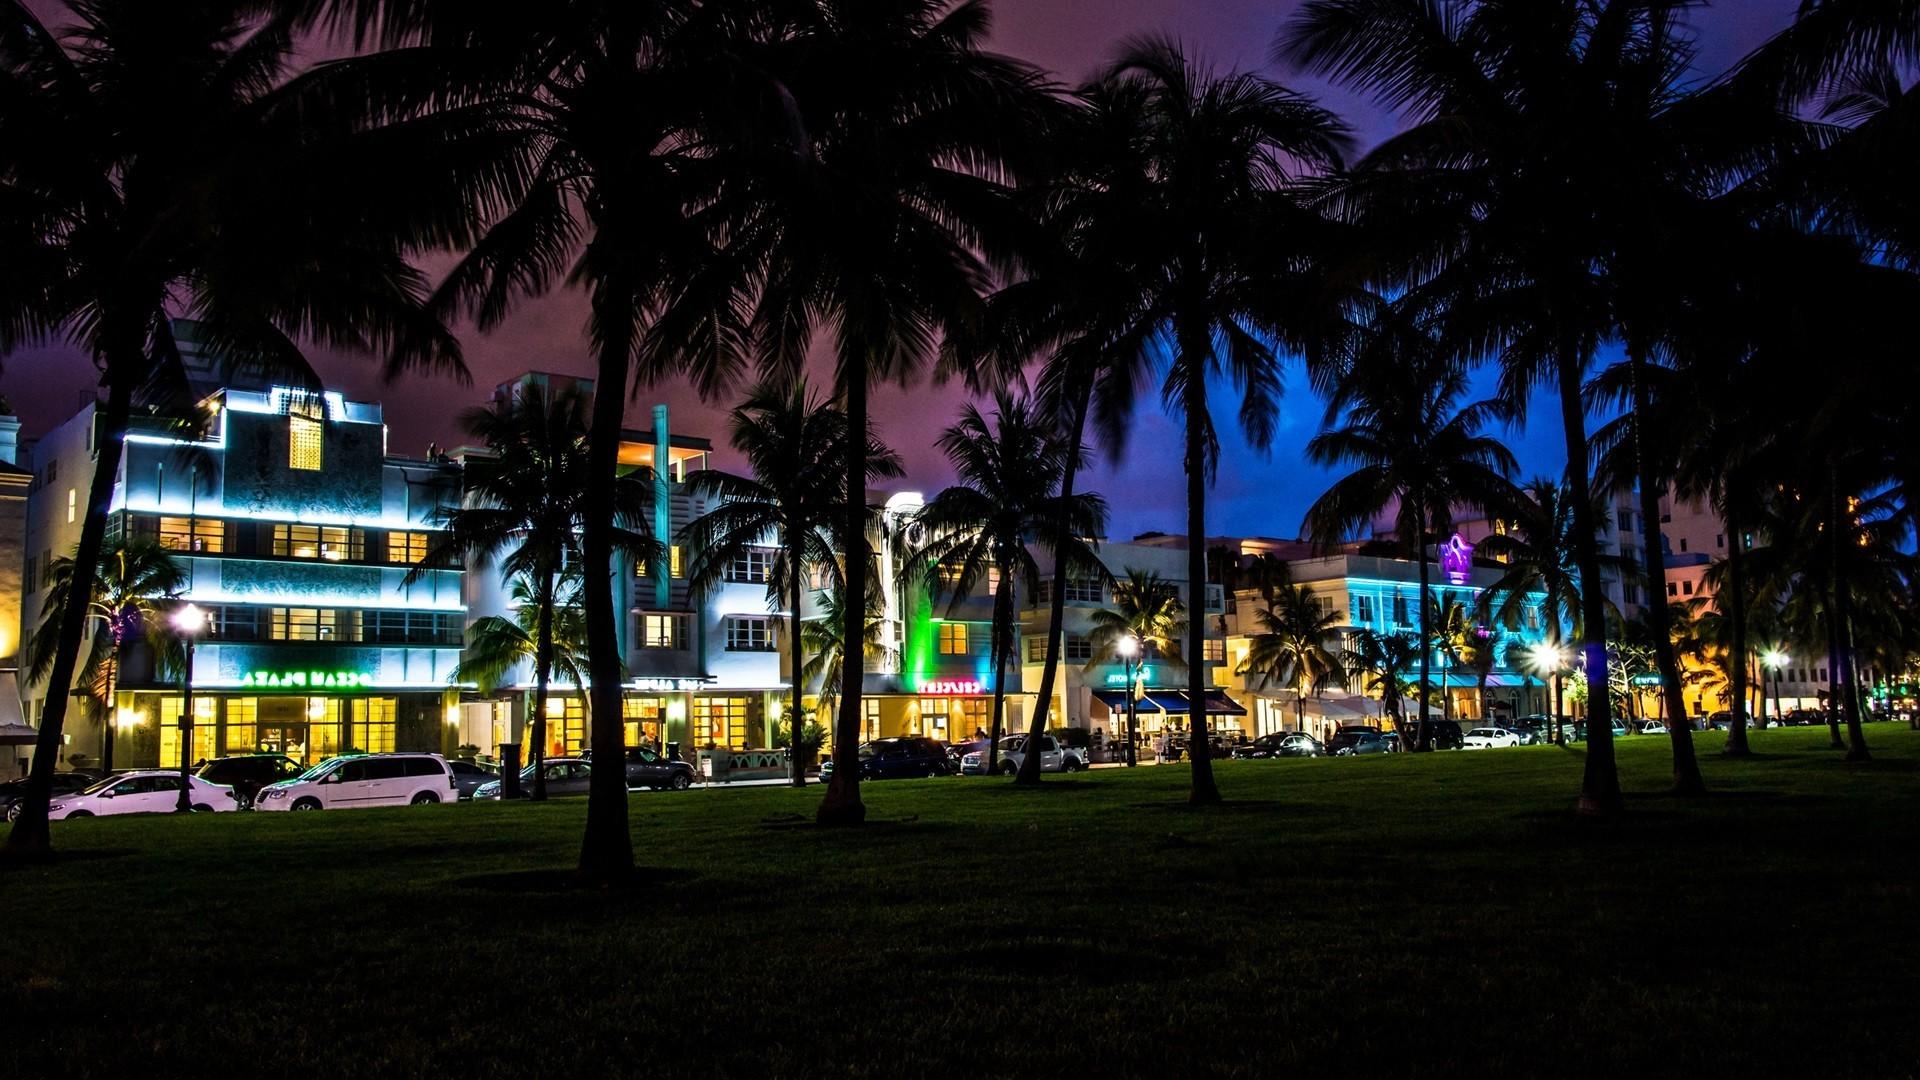 Most Inspiring Wallpaper Night Evening - city-cityscape-night-evening-palm-trees-town-dusk-Miami-Florida-South-Beach-light-downtown-lighting-1920x1080-px-urban-area-human-settlement-517906  Photograph-526048.jpg